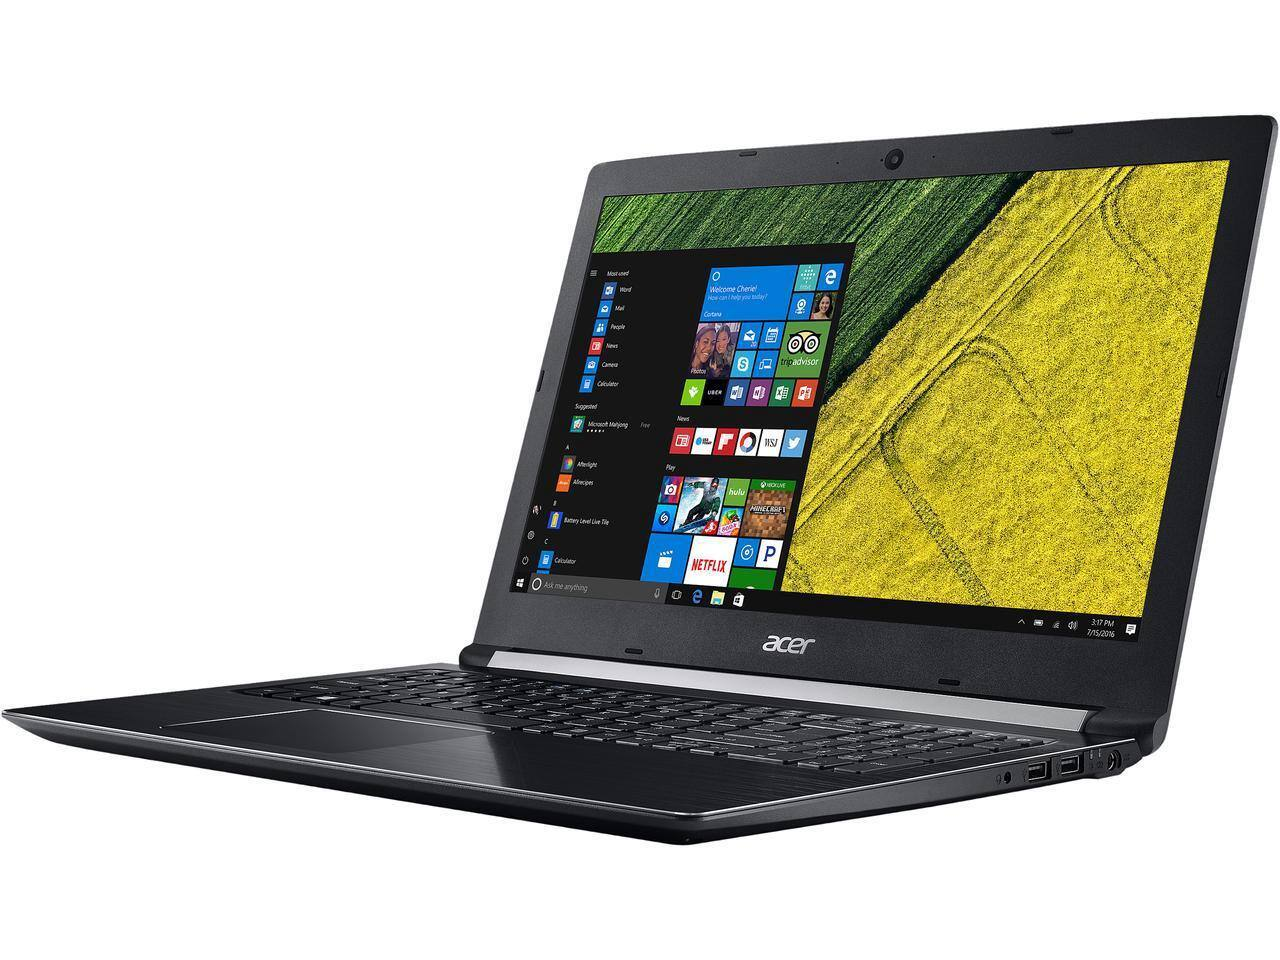 "ACER i5 7th Gen 7200U (2.50 GHz) 8 GB DDR4 Memory 1 TB HDD NVIDIA GeForce 940MX 15.6"" Windows 10 Home for $499.99"